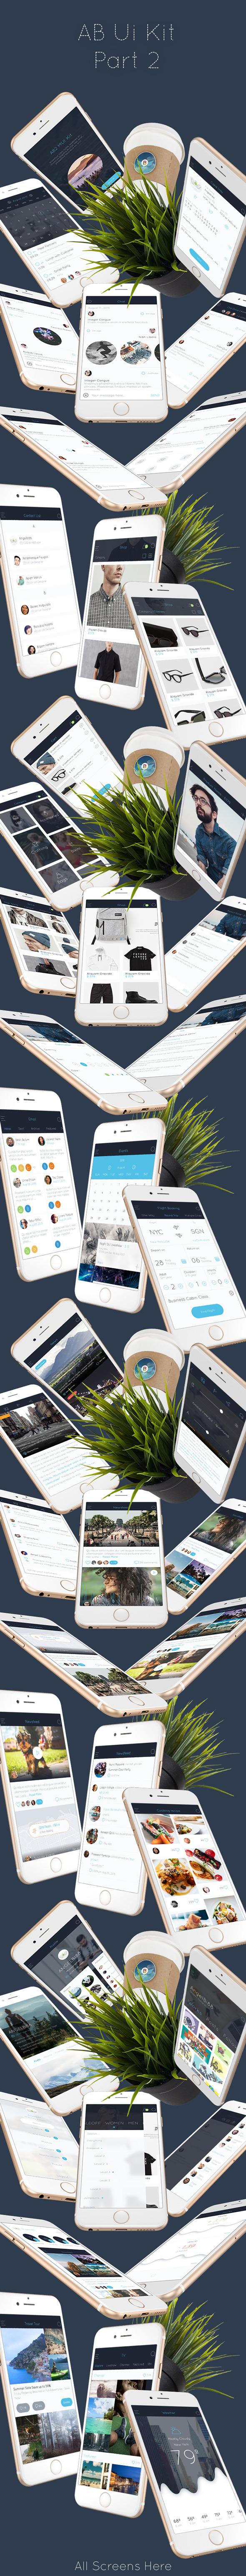 AB Part 2 - Mobile UI Kit - 1